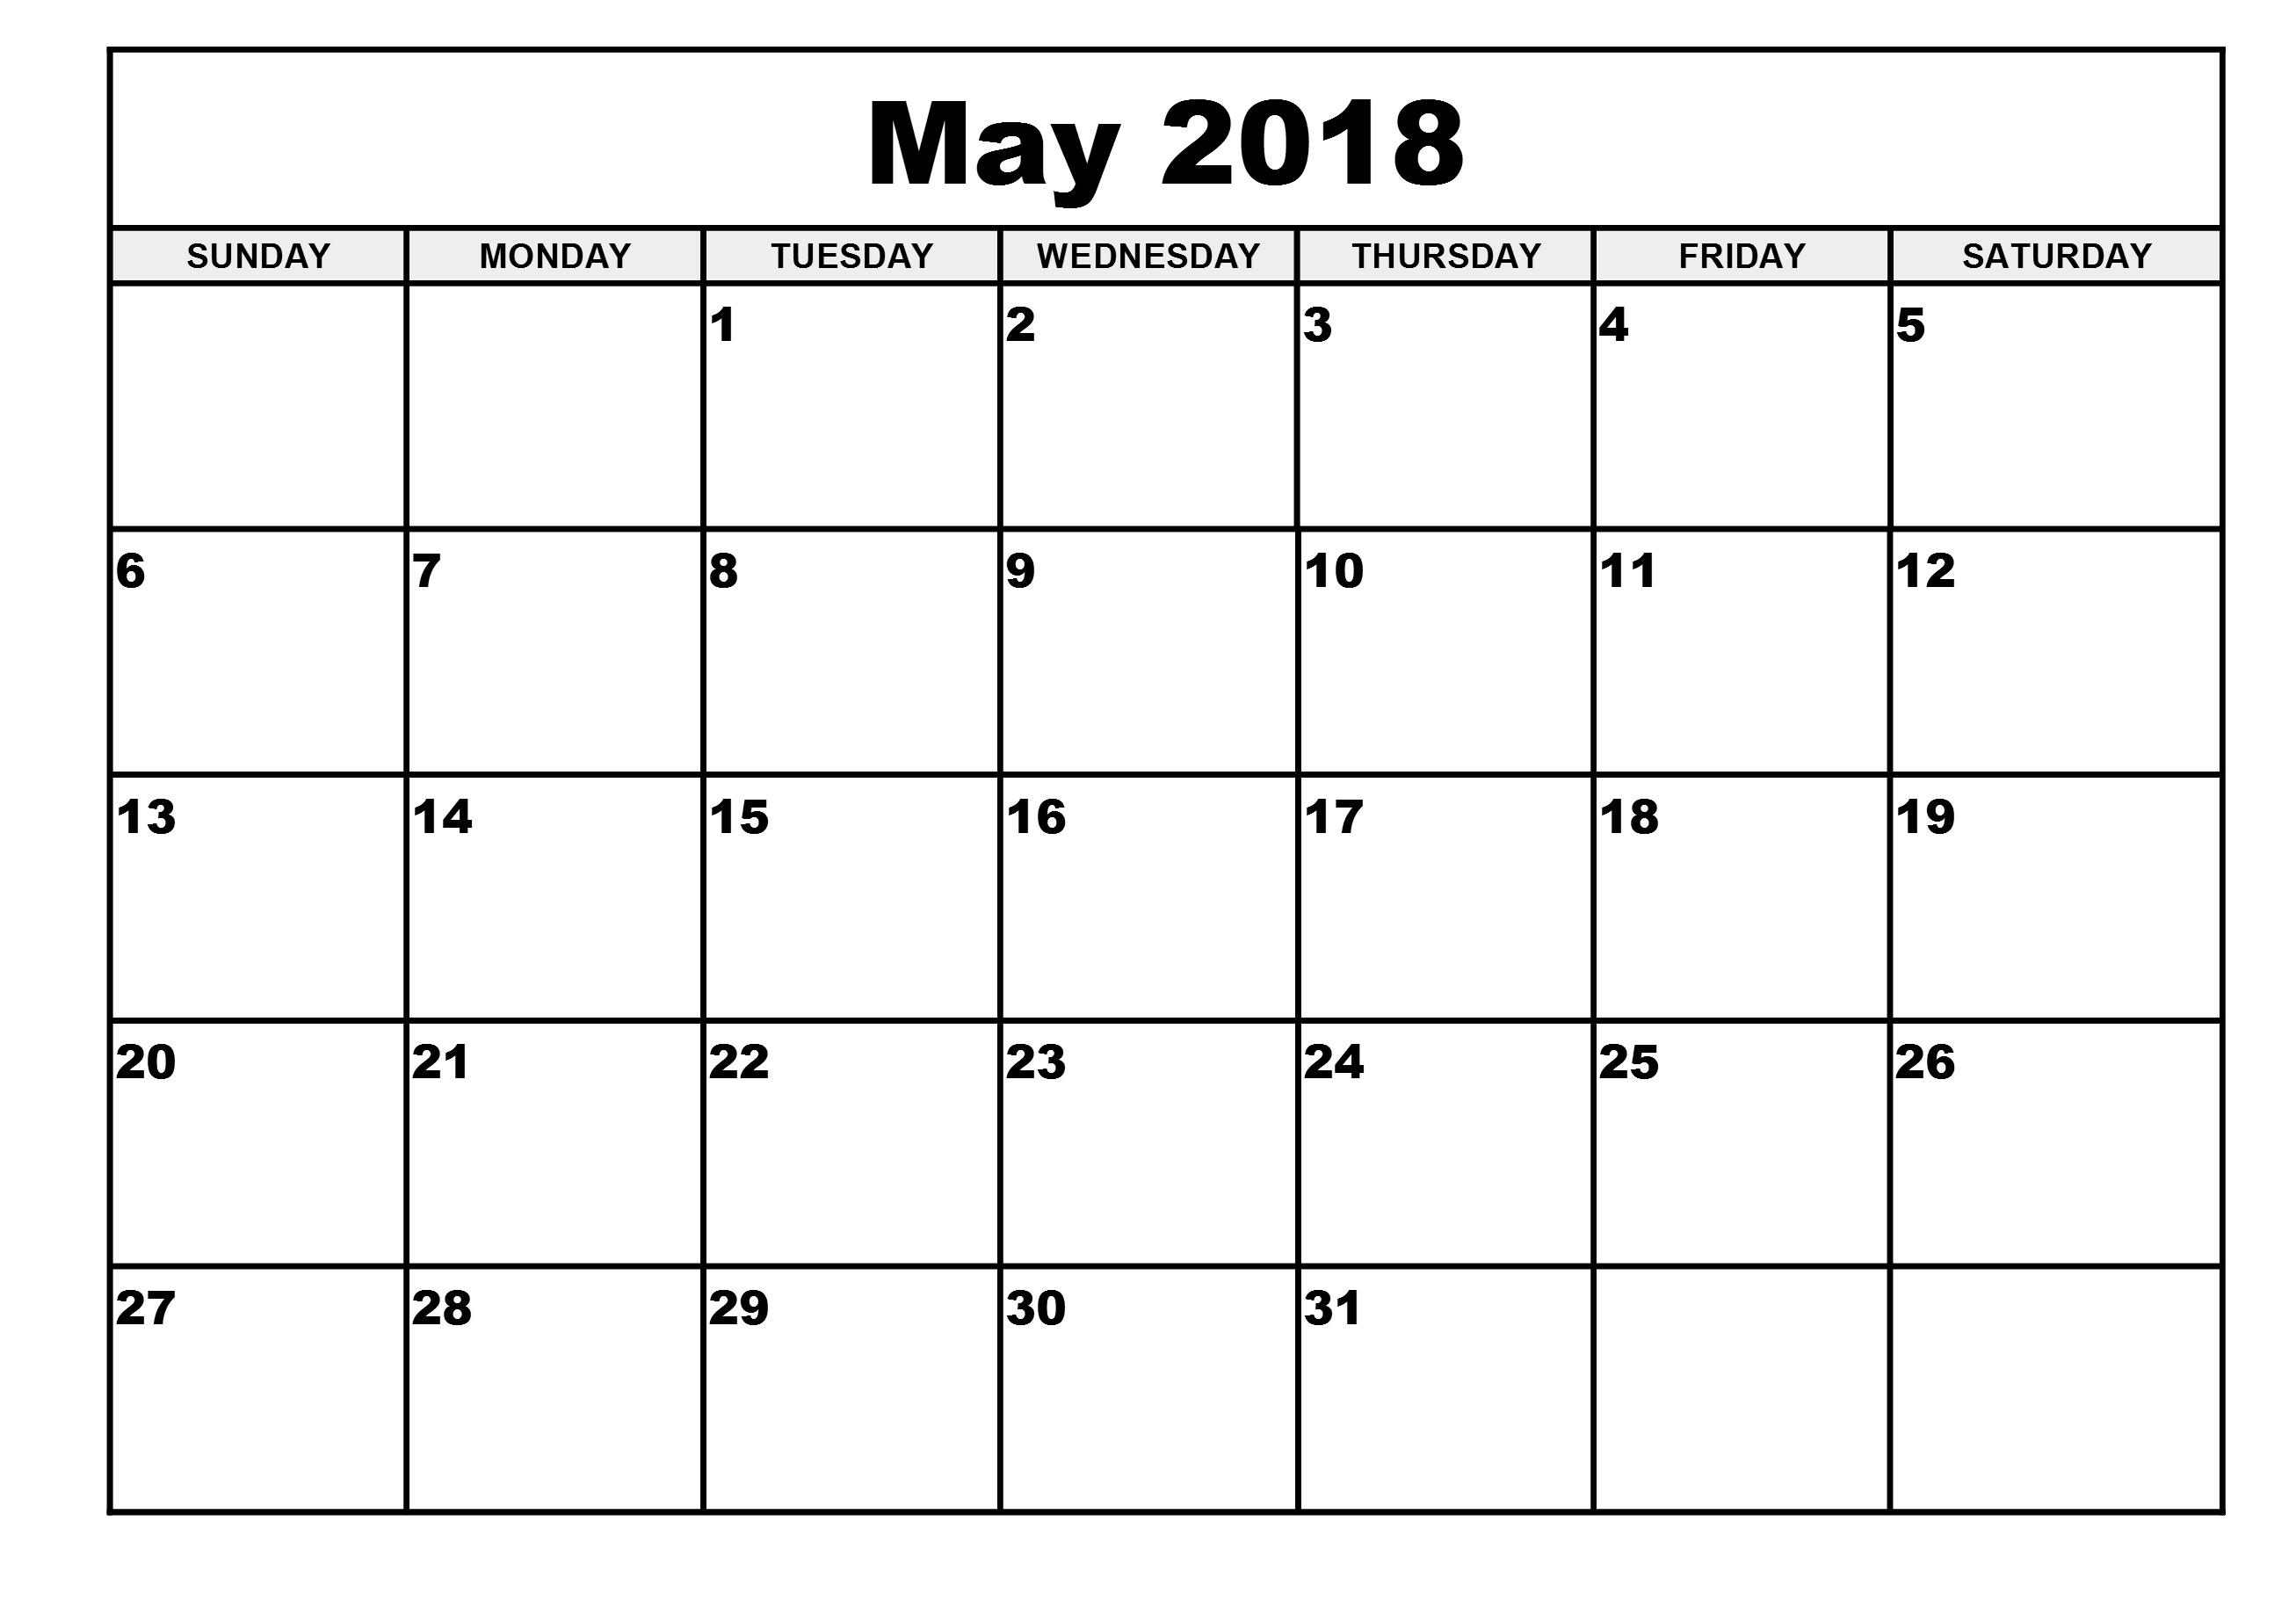 May 2018 Excel Calendar